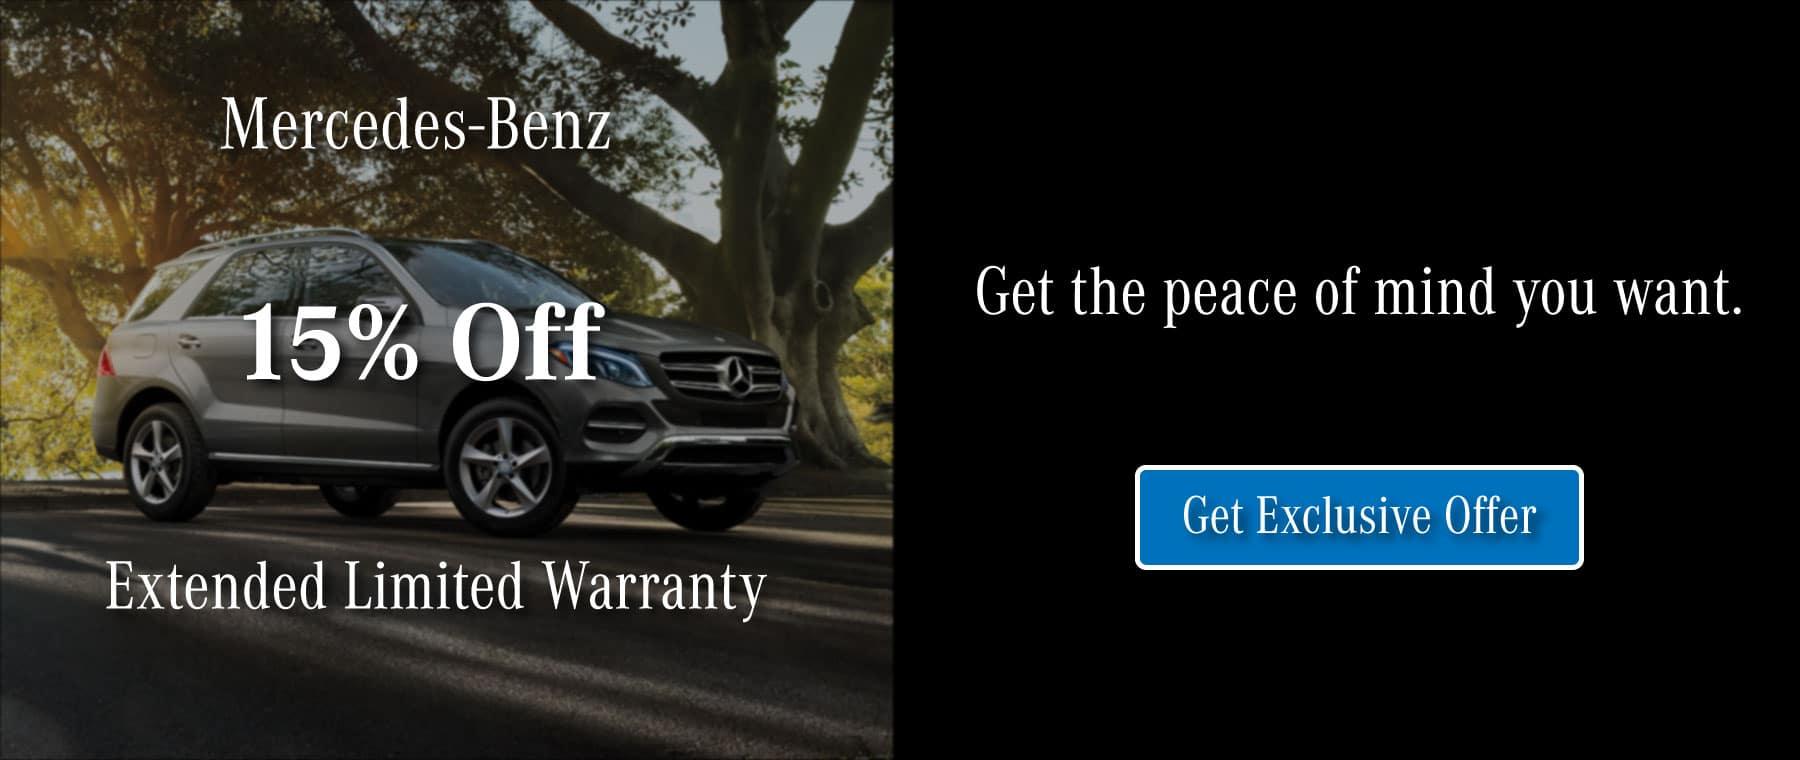 Mercedes-benz of spokane extended limited warranty